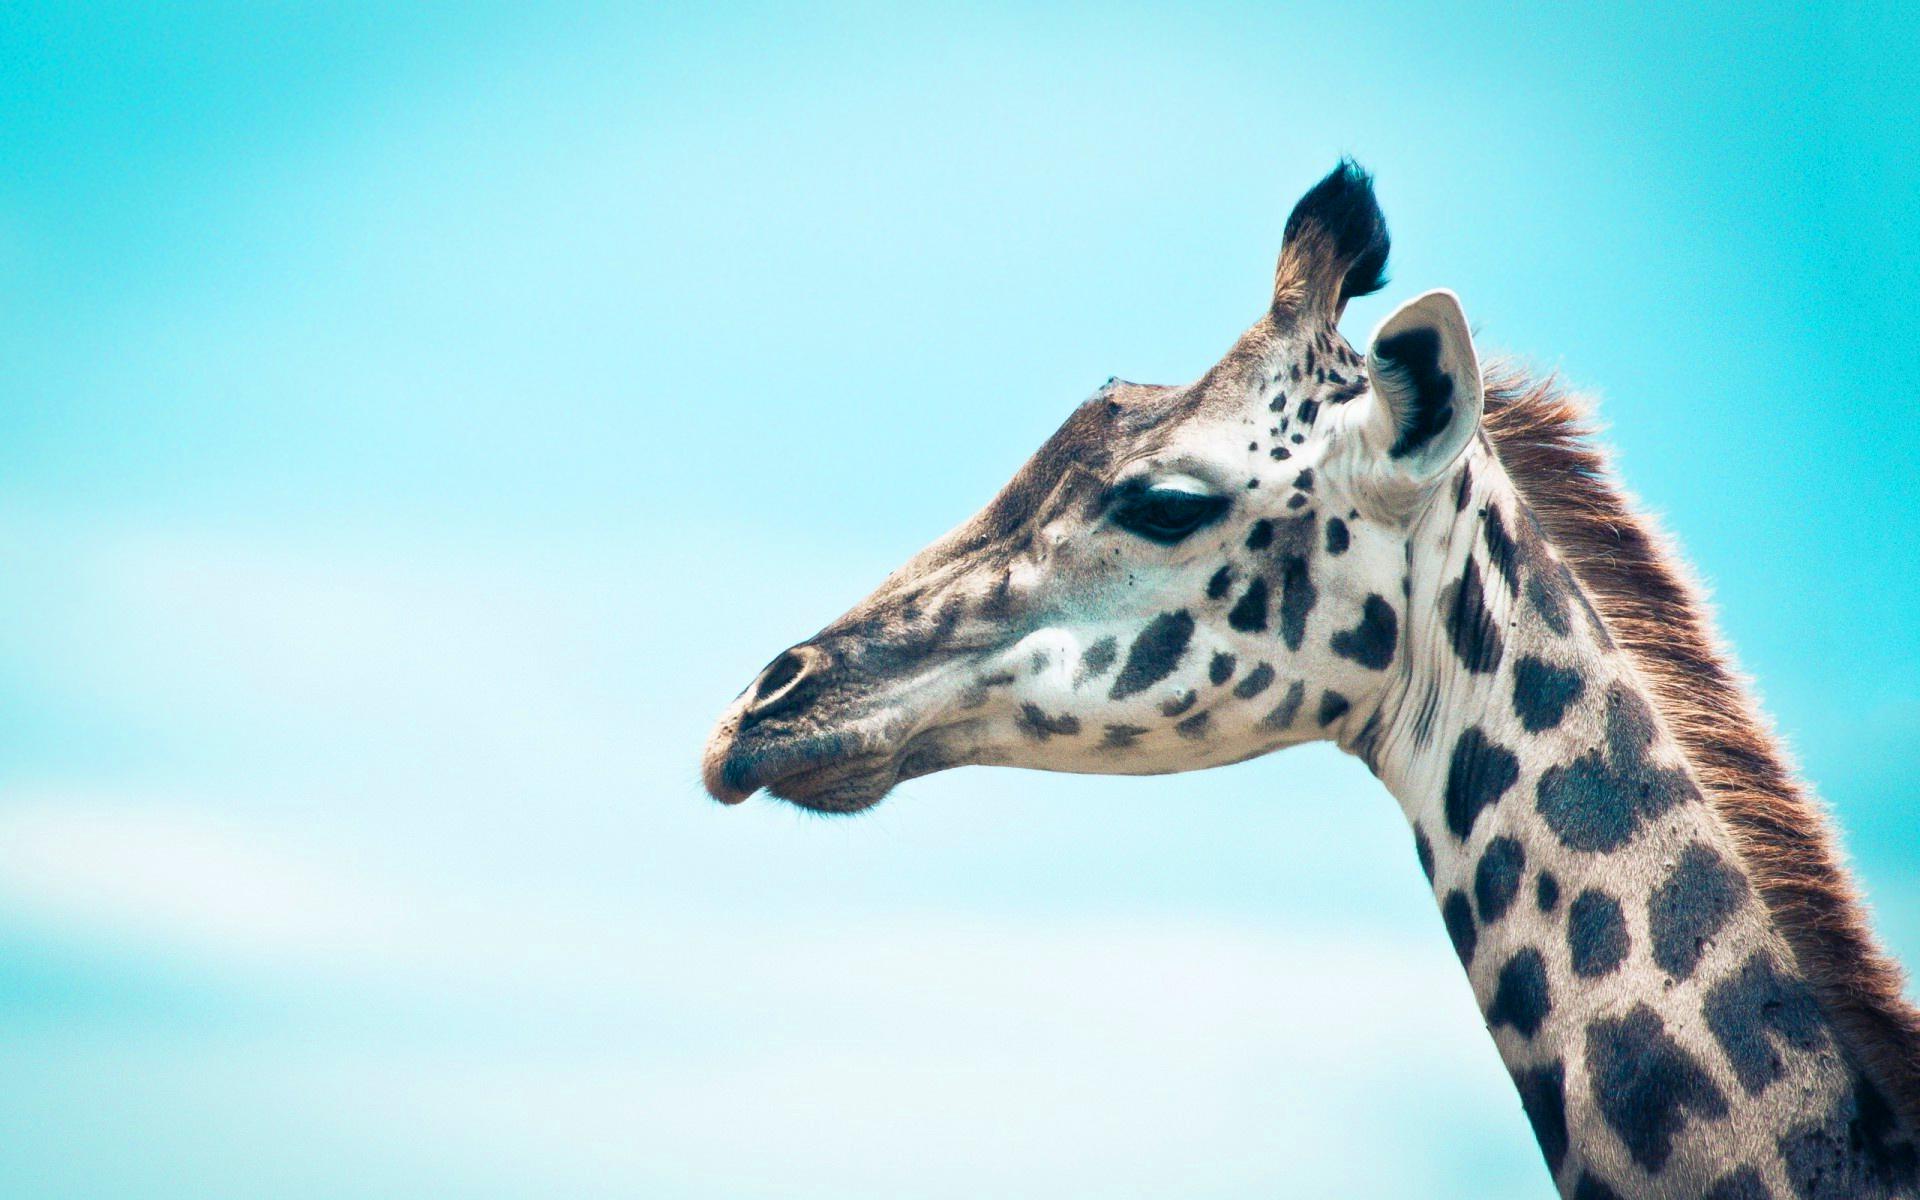 4K Giraffe Wallpapers High Quality